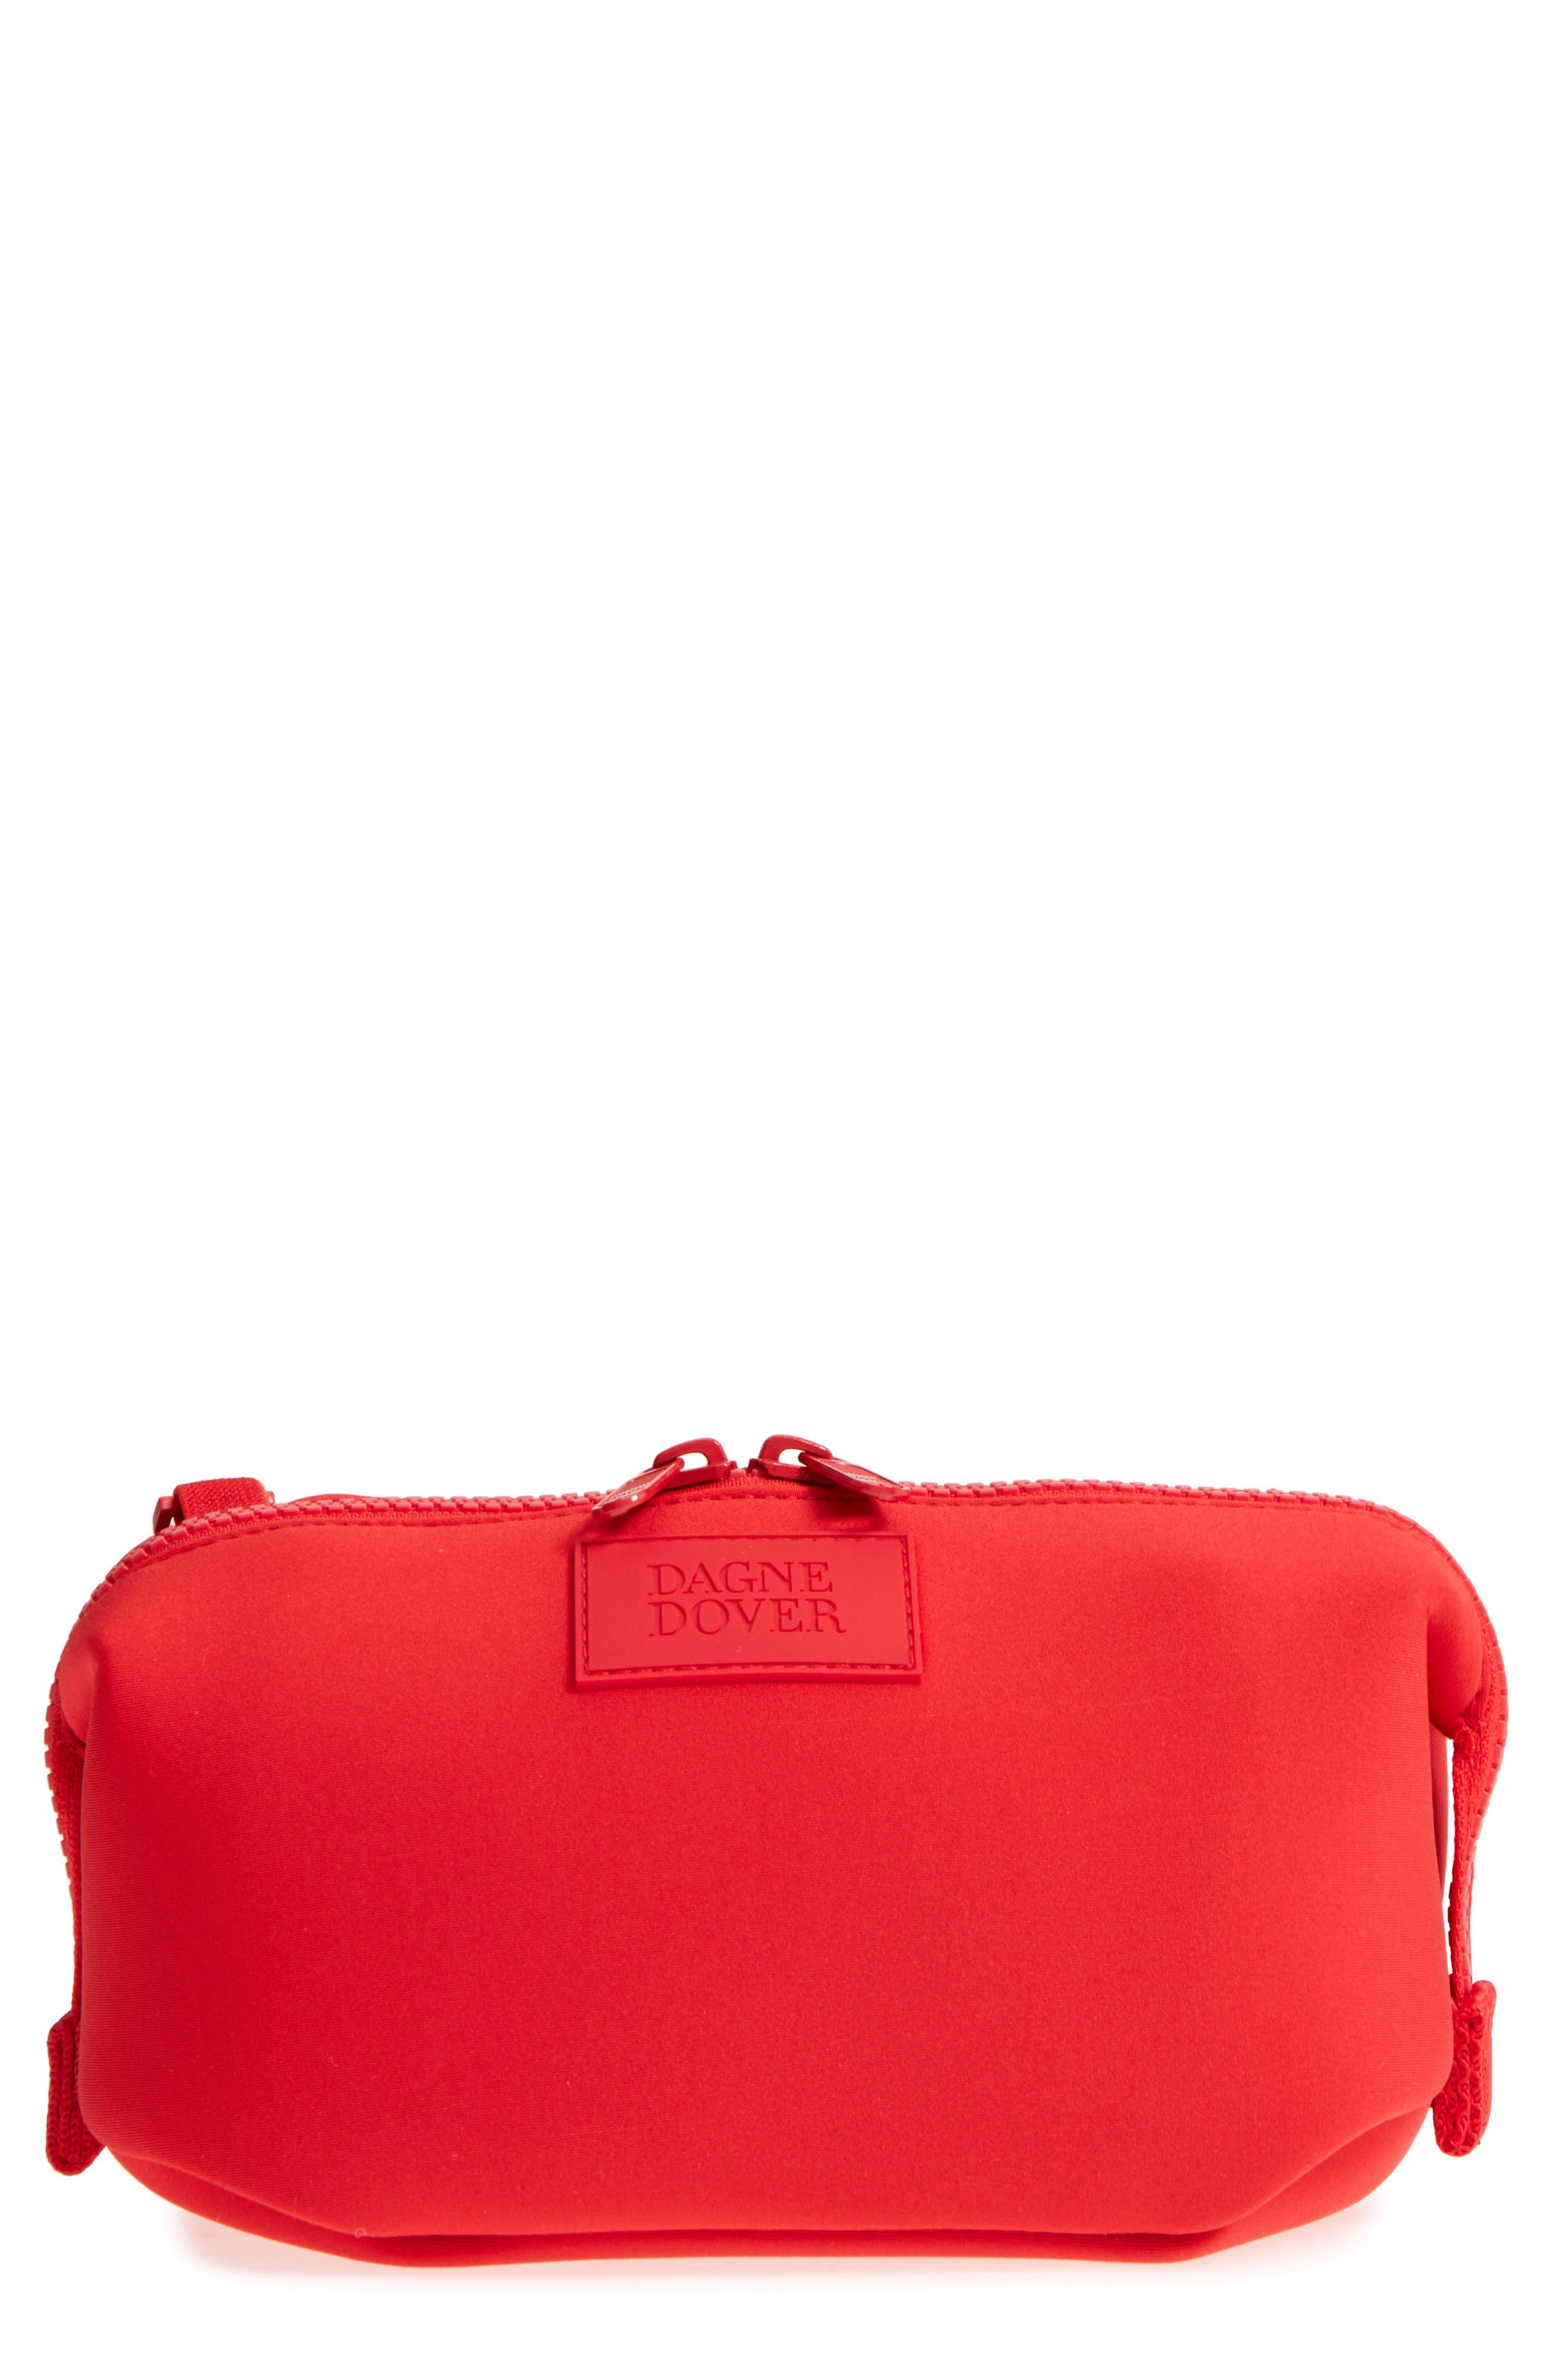 8cc5436746 Dagne Dover Small Hunter Neoprene Toiletry Bag In Poppy